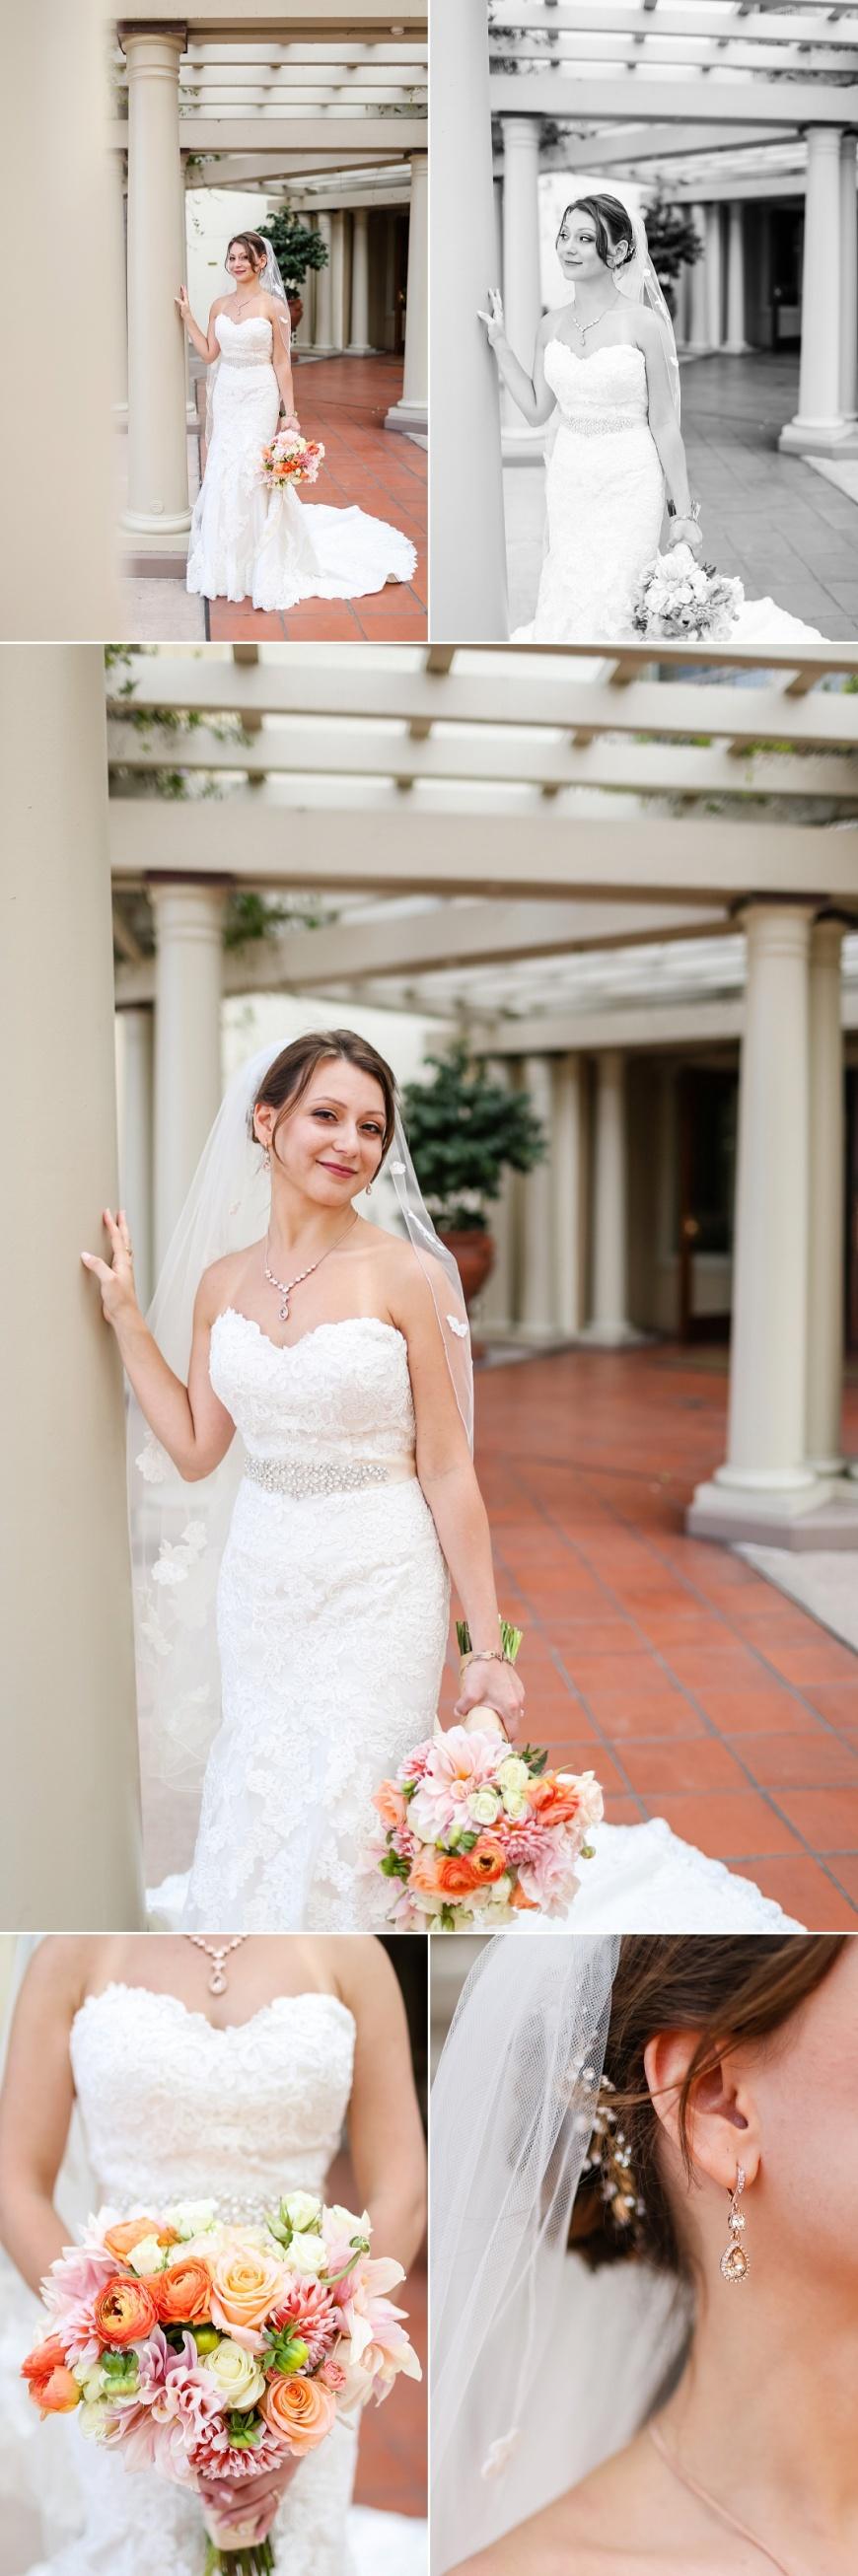 Monterey-Plaza-Hotel-Wedding-Photographer_1020.jpg